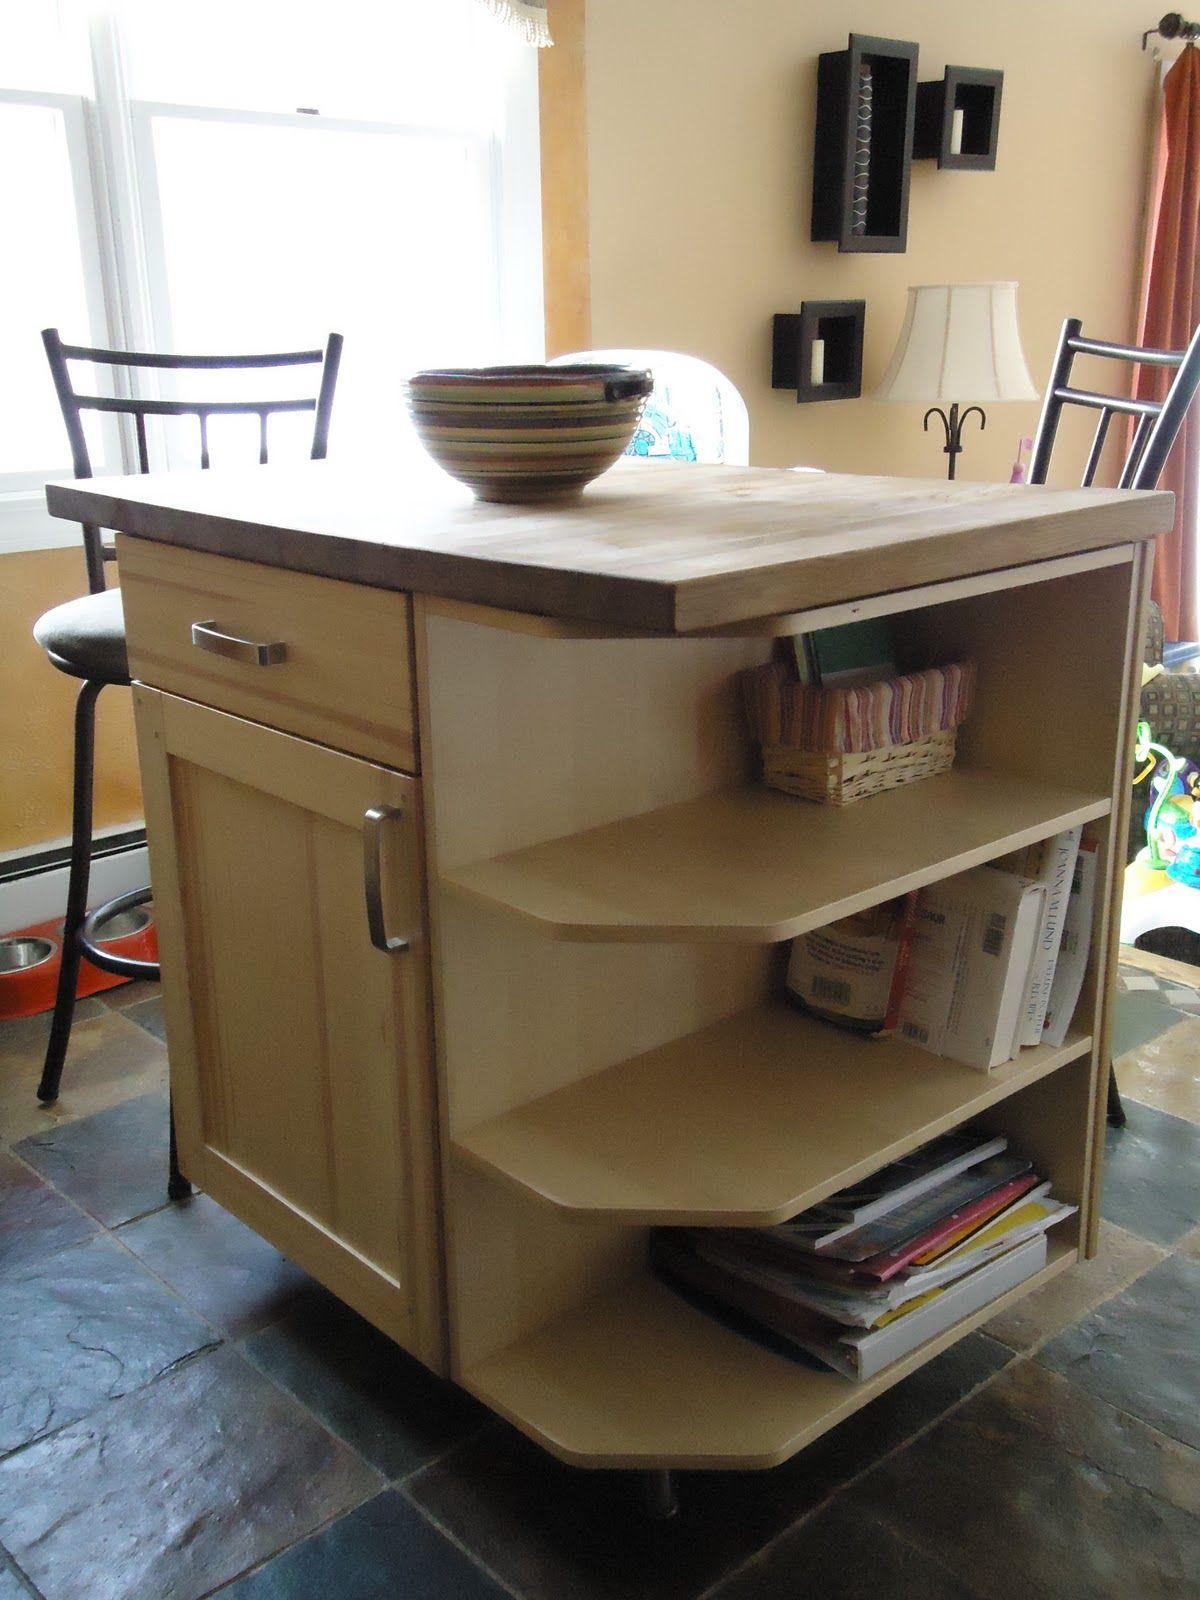 A DIY kitchen island using Ikea parts. | Ikea kitchen ...